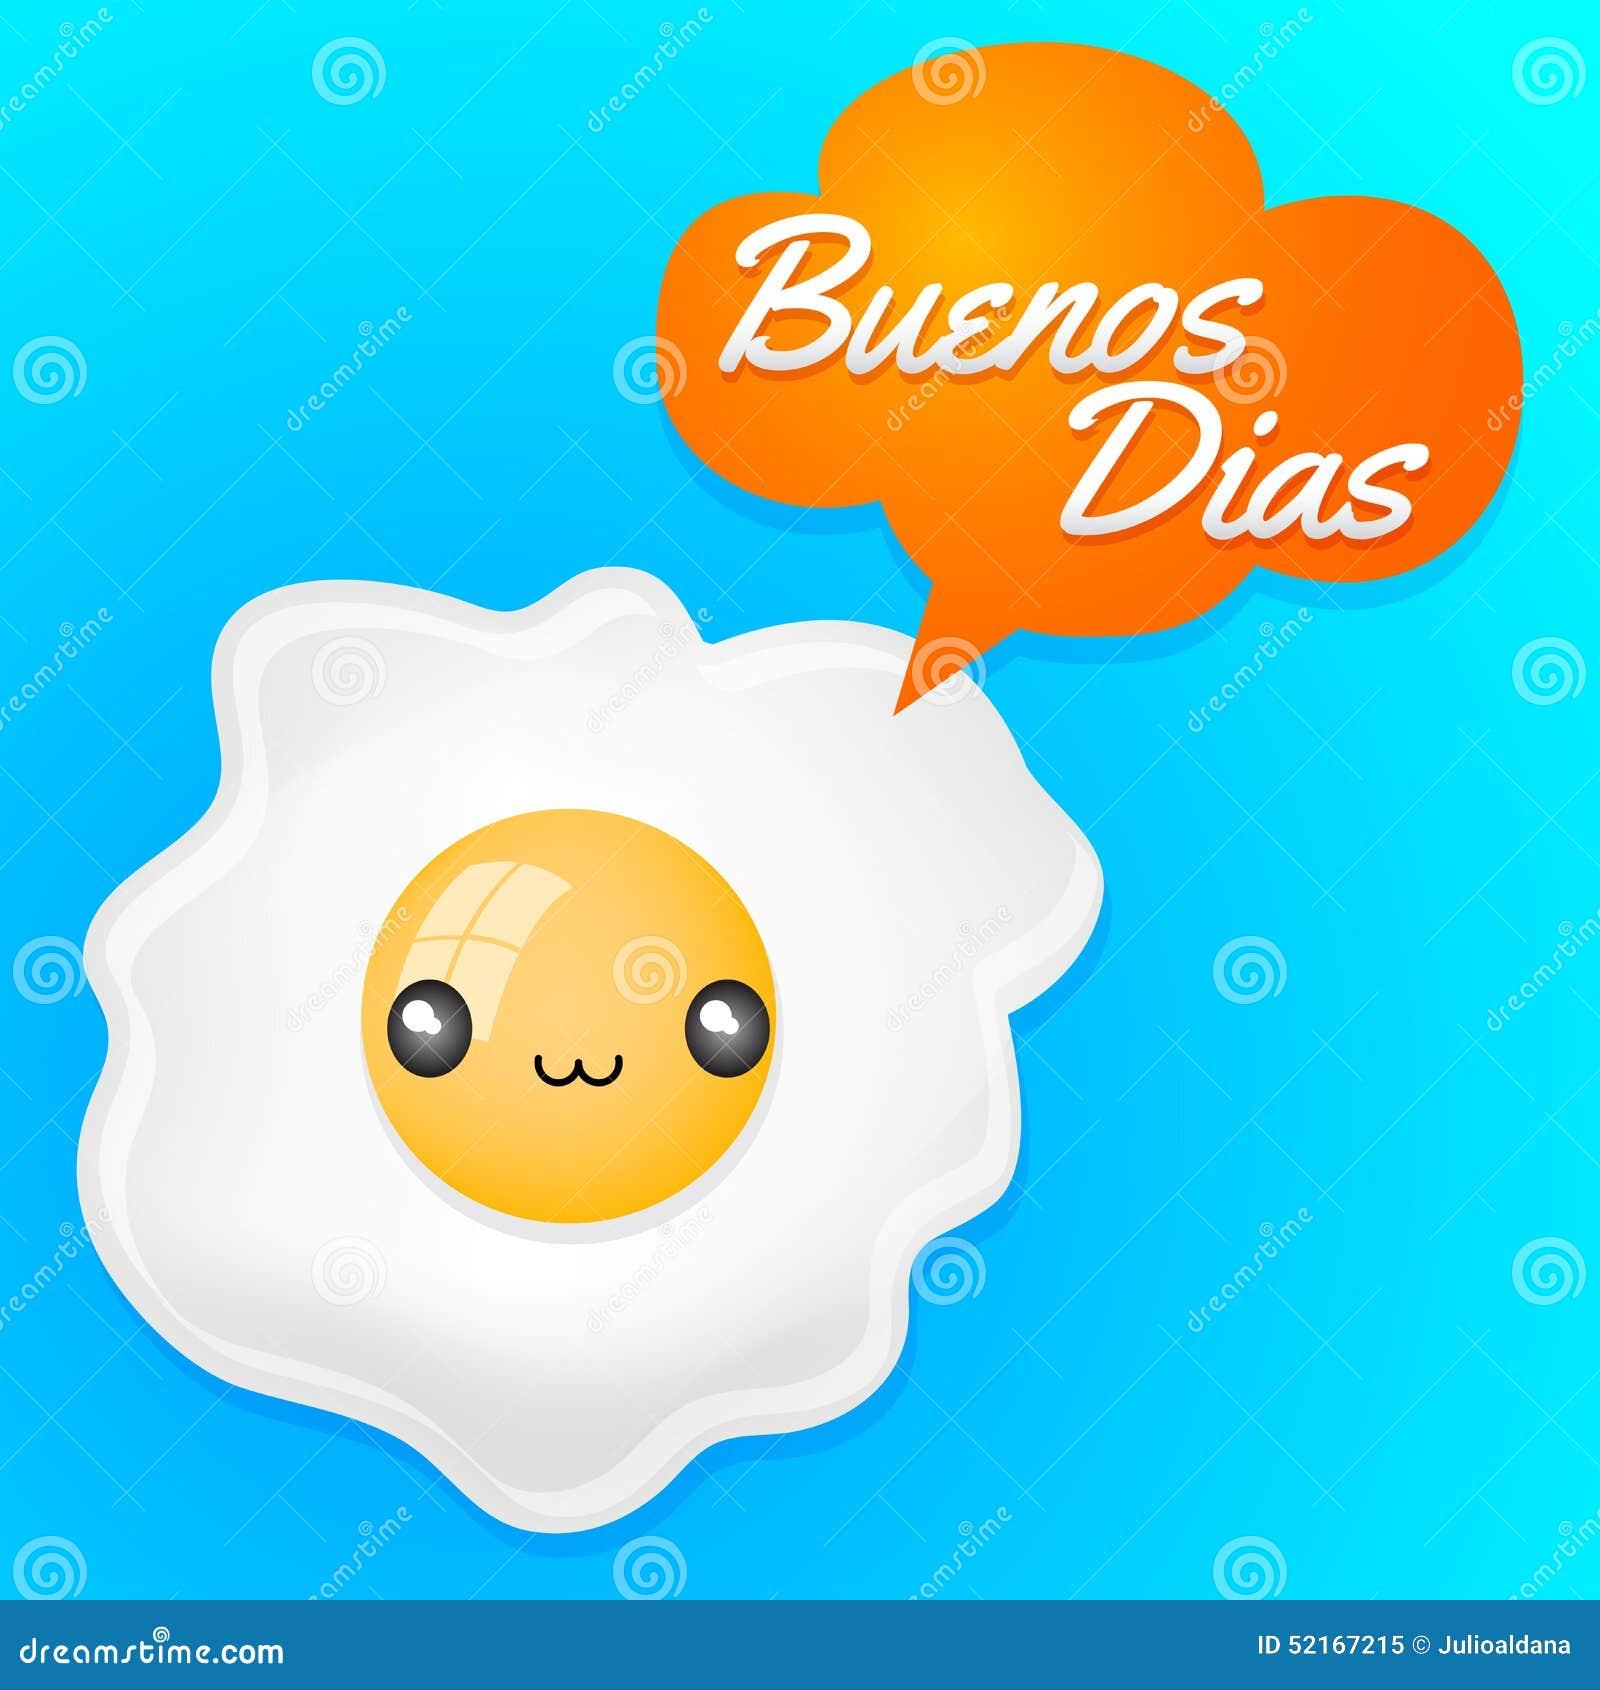 Spanischtext Guten Morgens Buenos Dias Vektor Abbildung